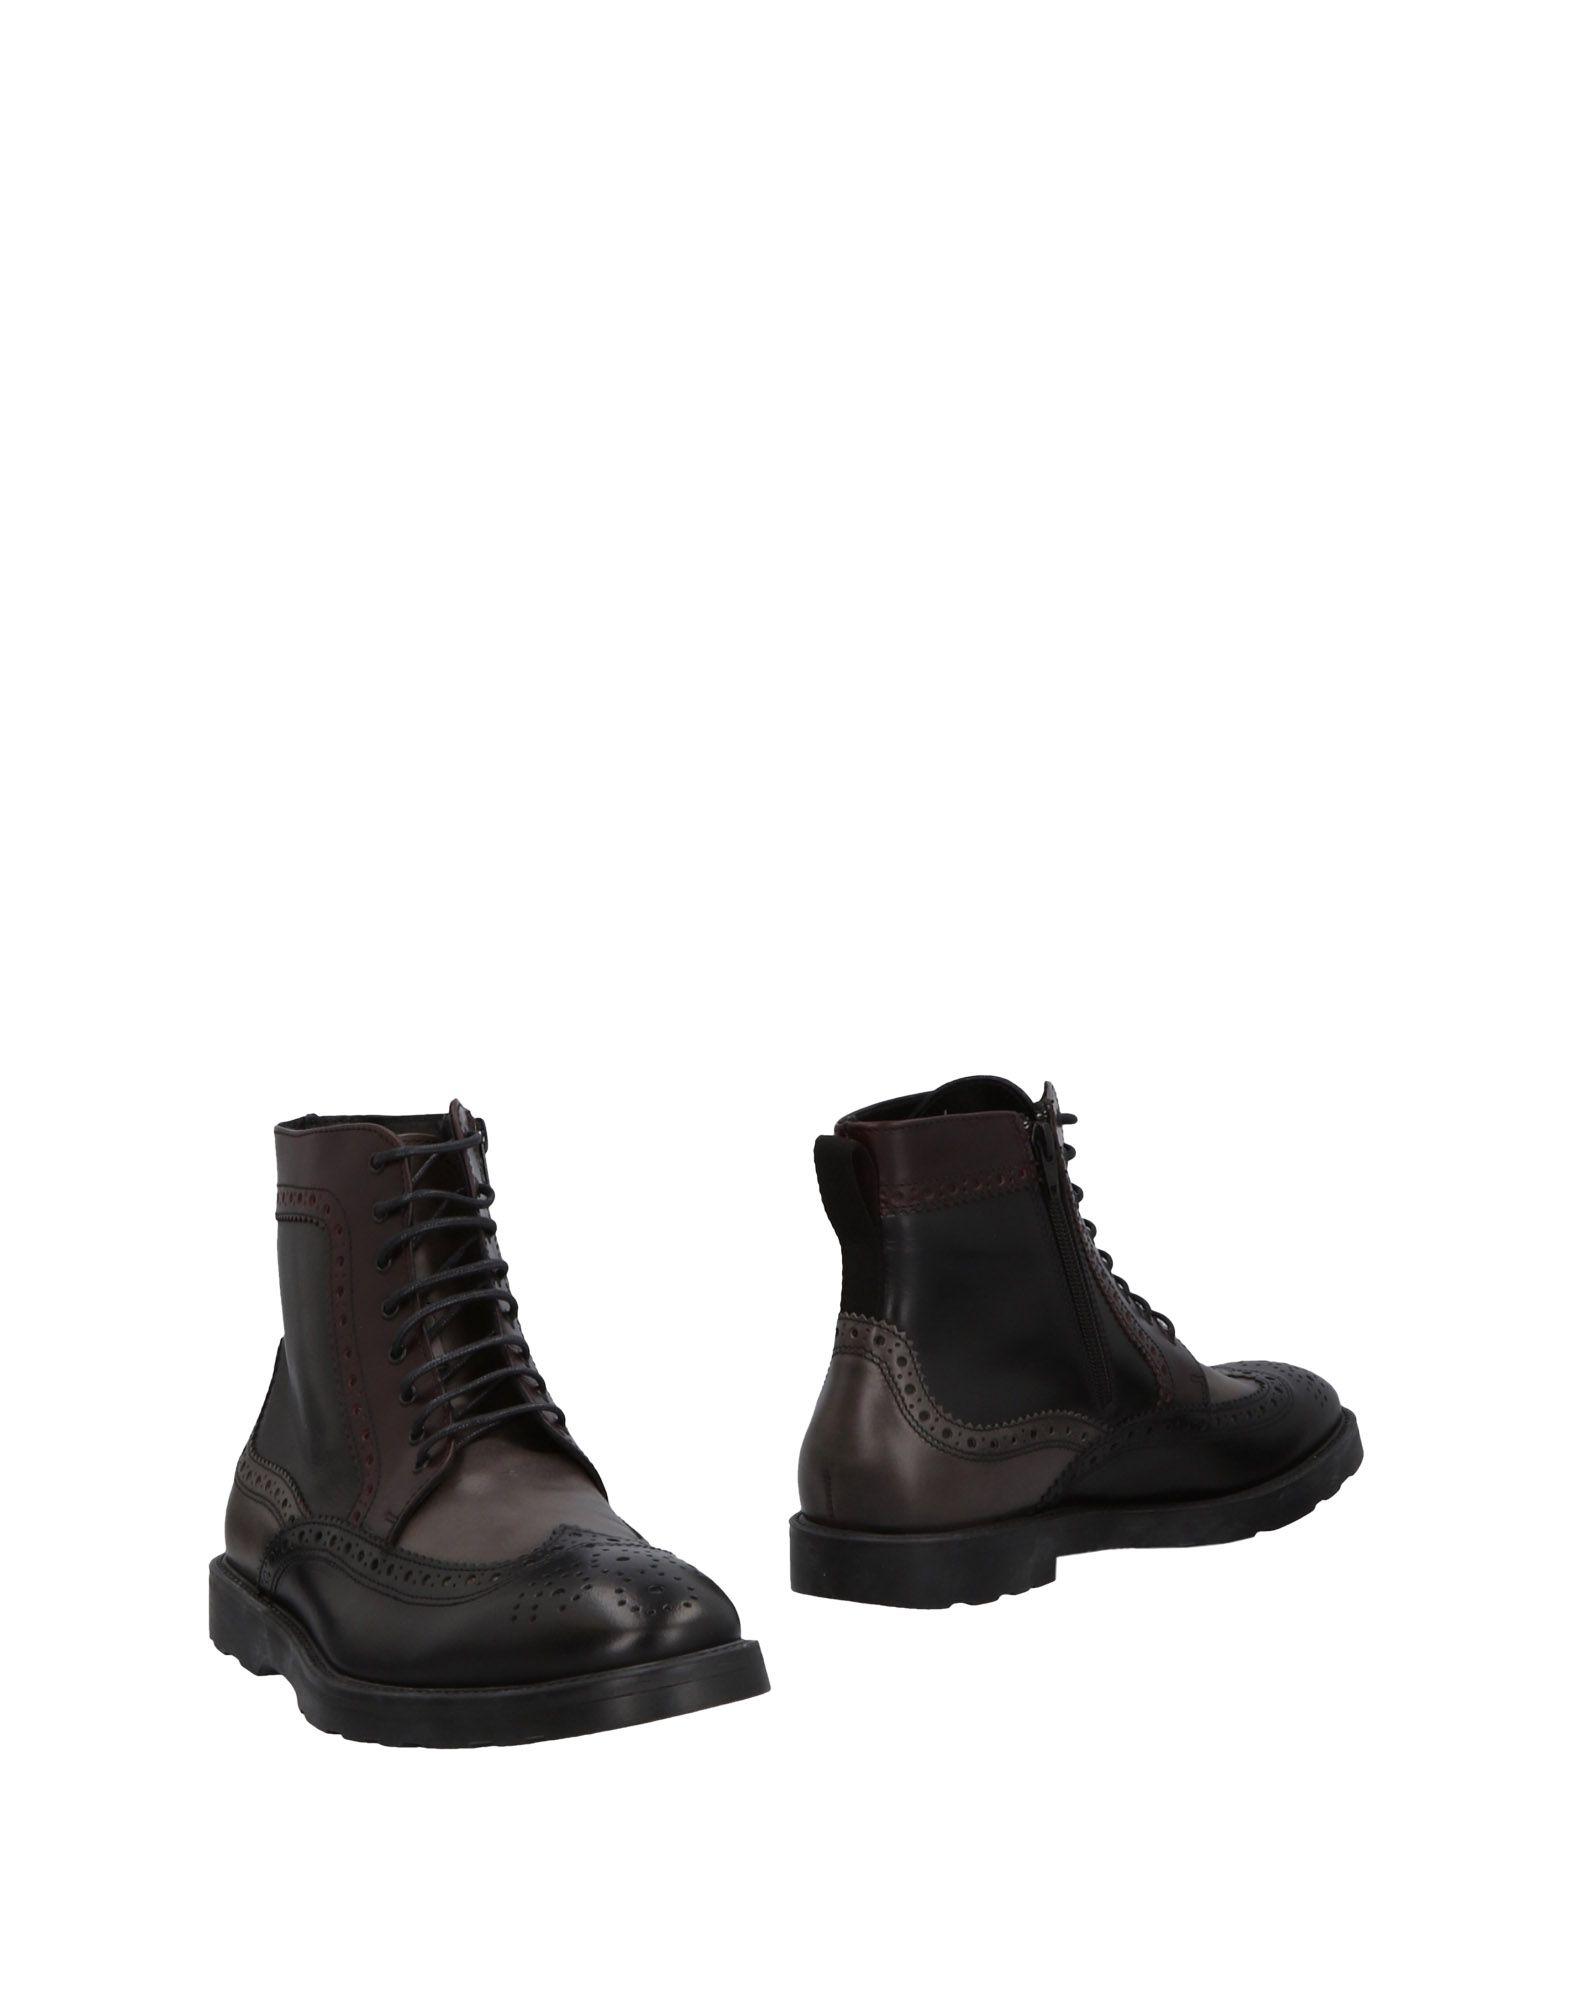 Rabatt Herren echte Schuhe Dama Stiefelette Herren Rabatt  11462658XO 0b1069